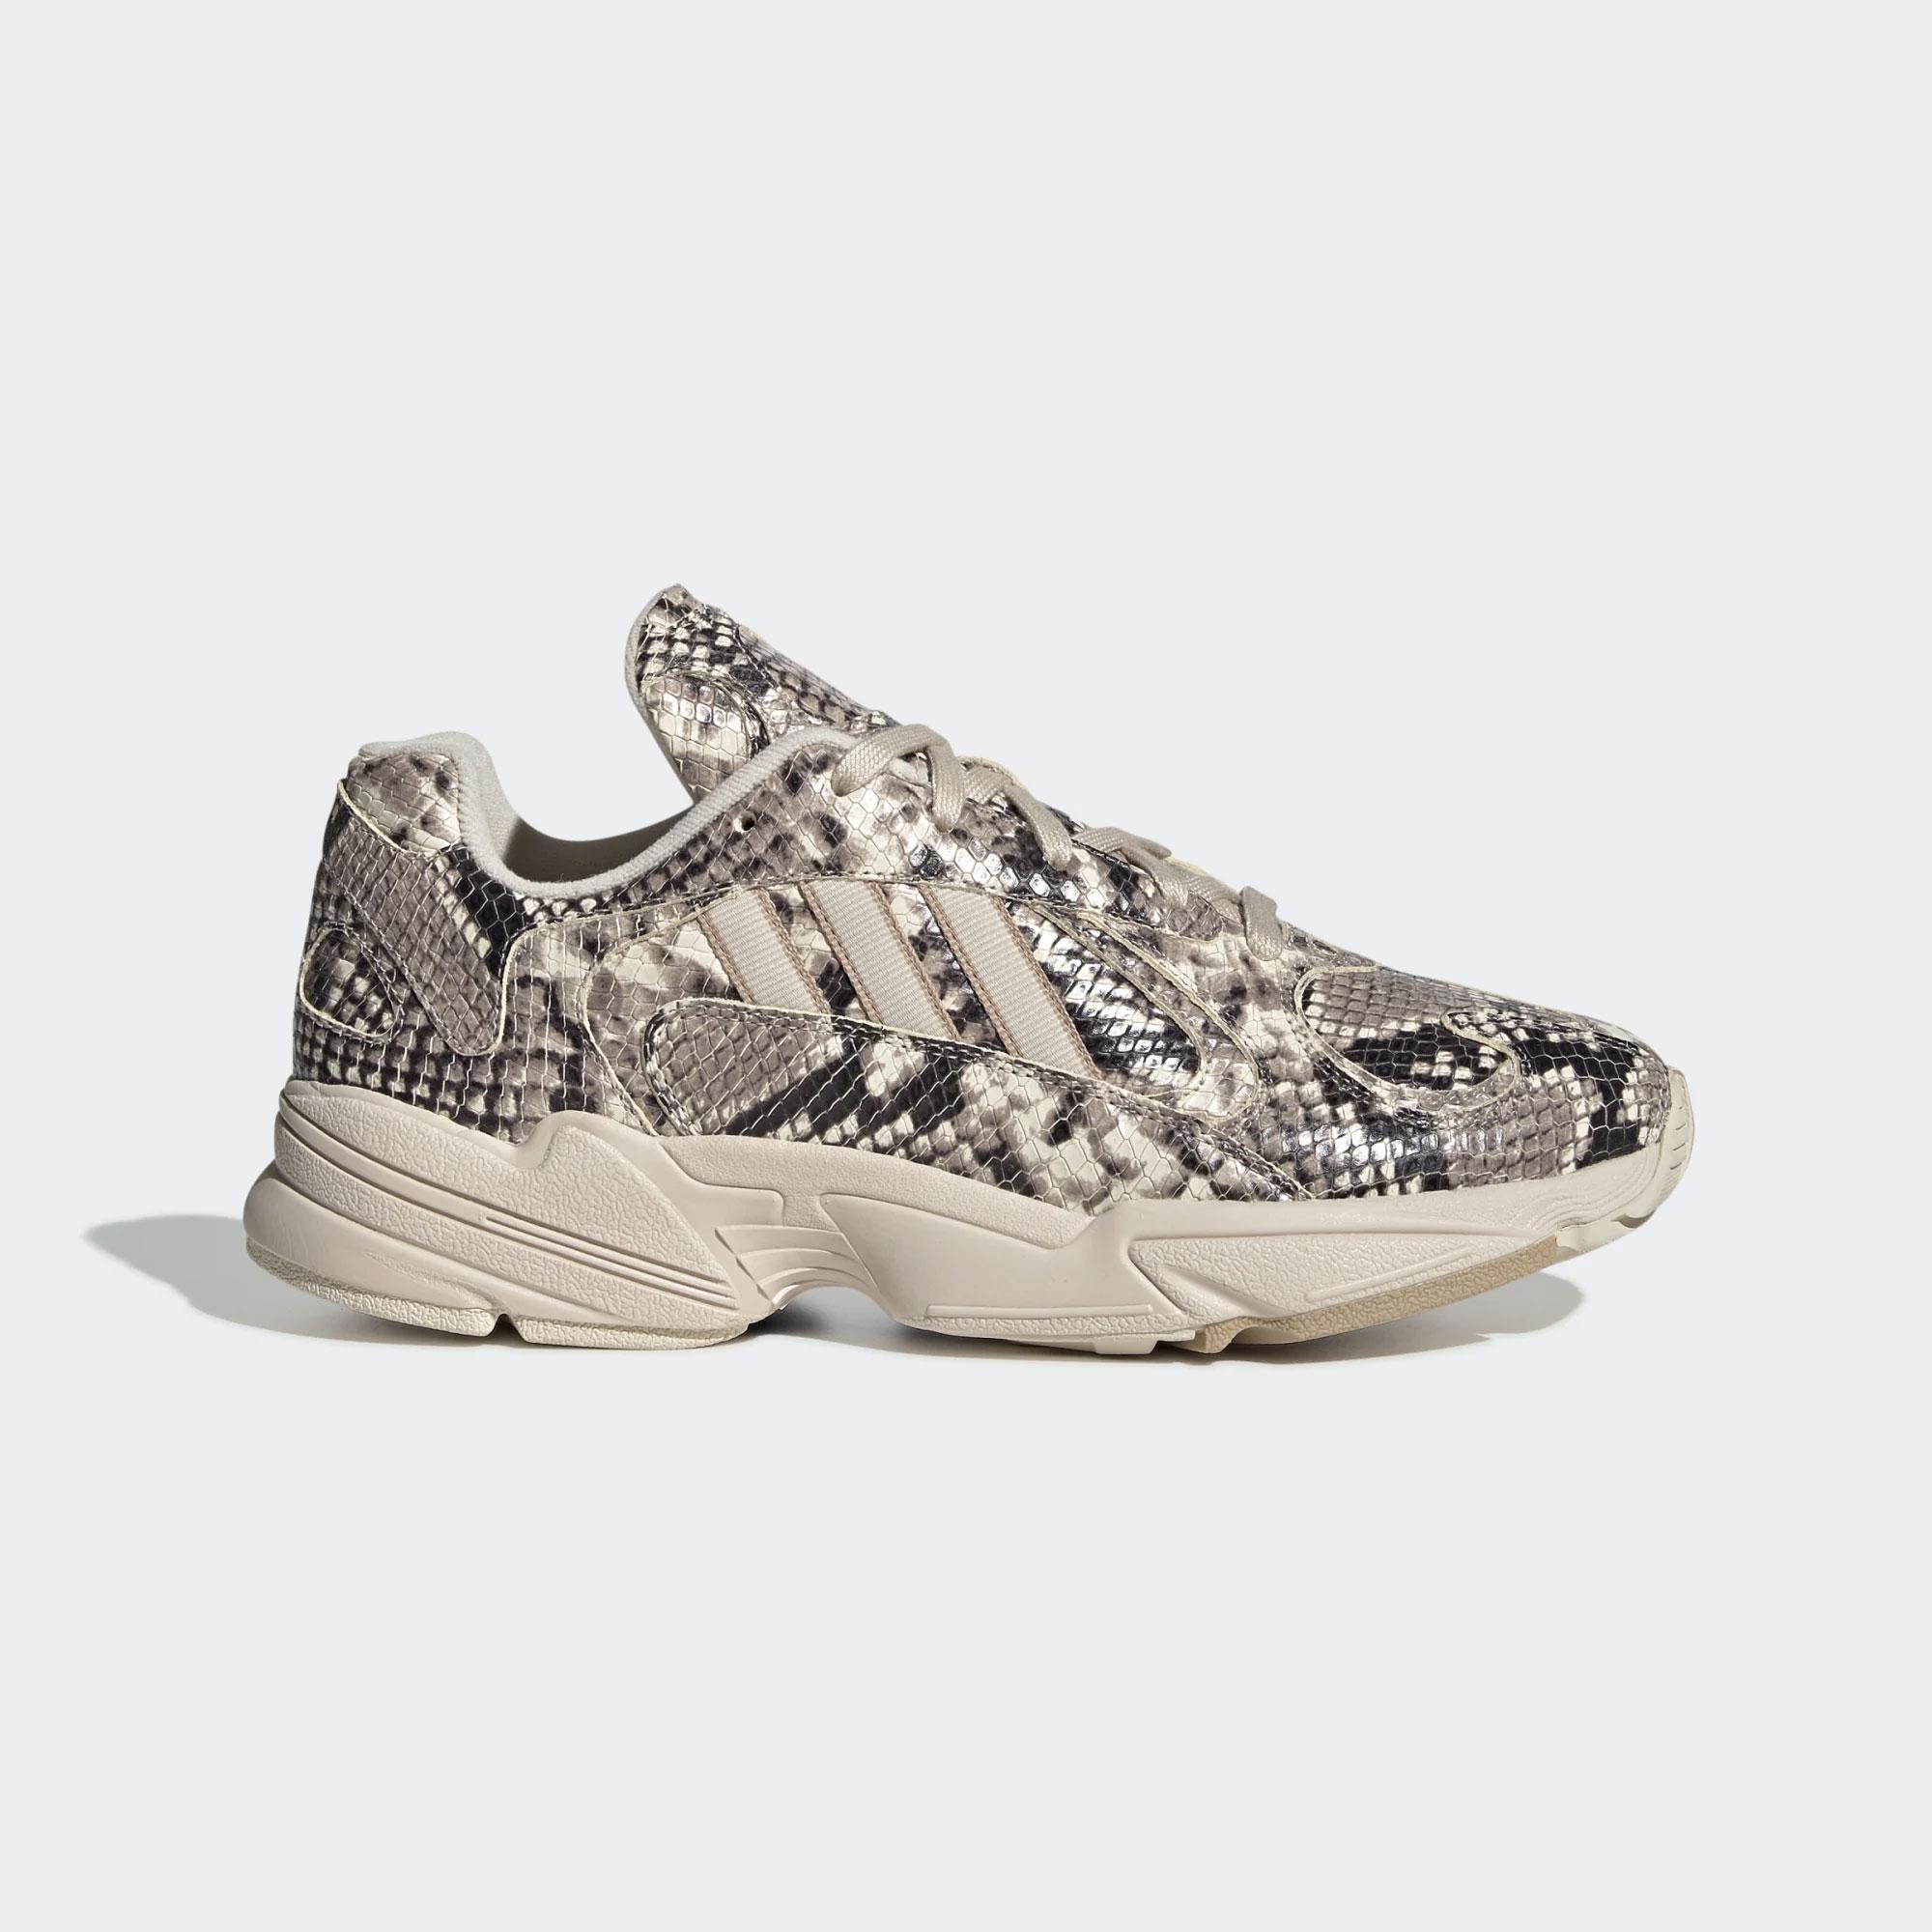 YUNG-1 sneakers @ adidas